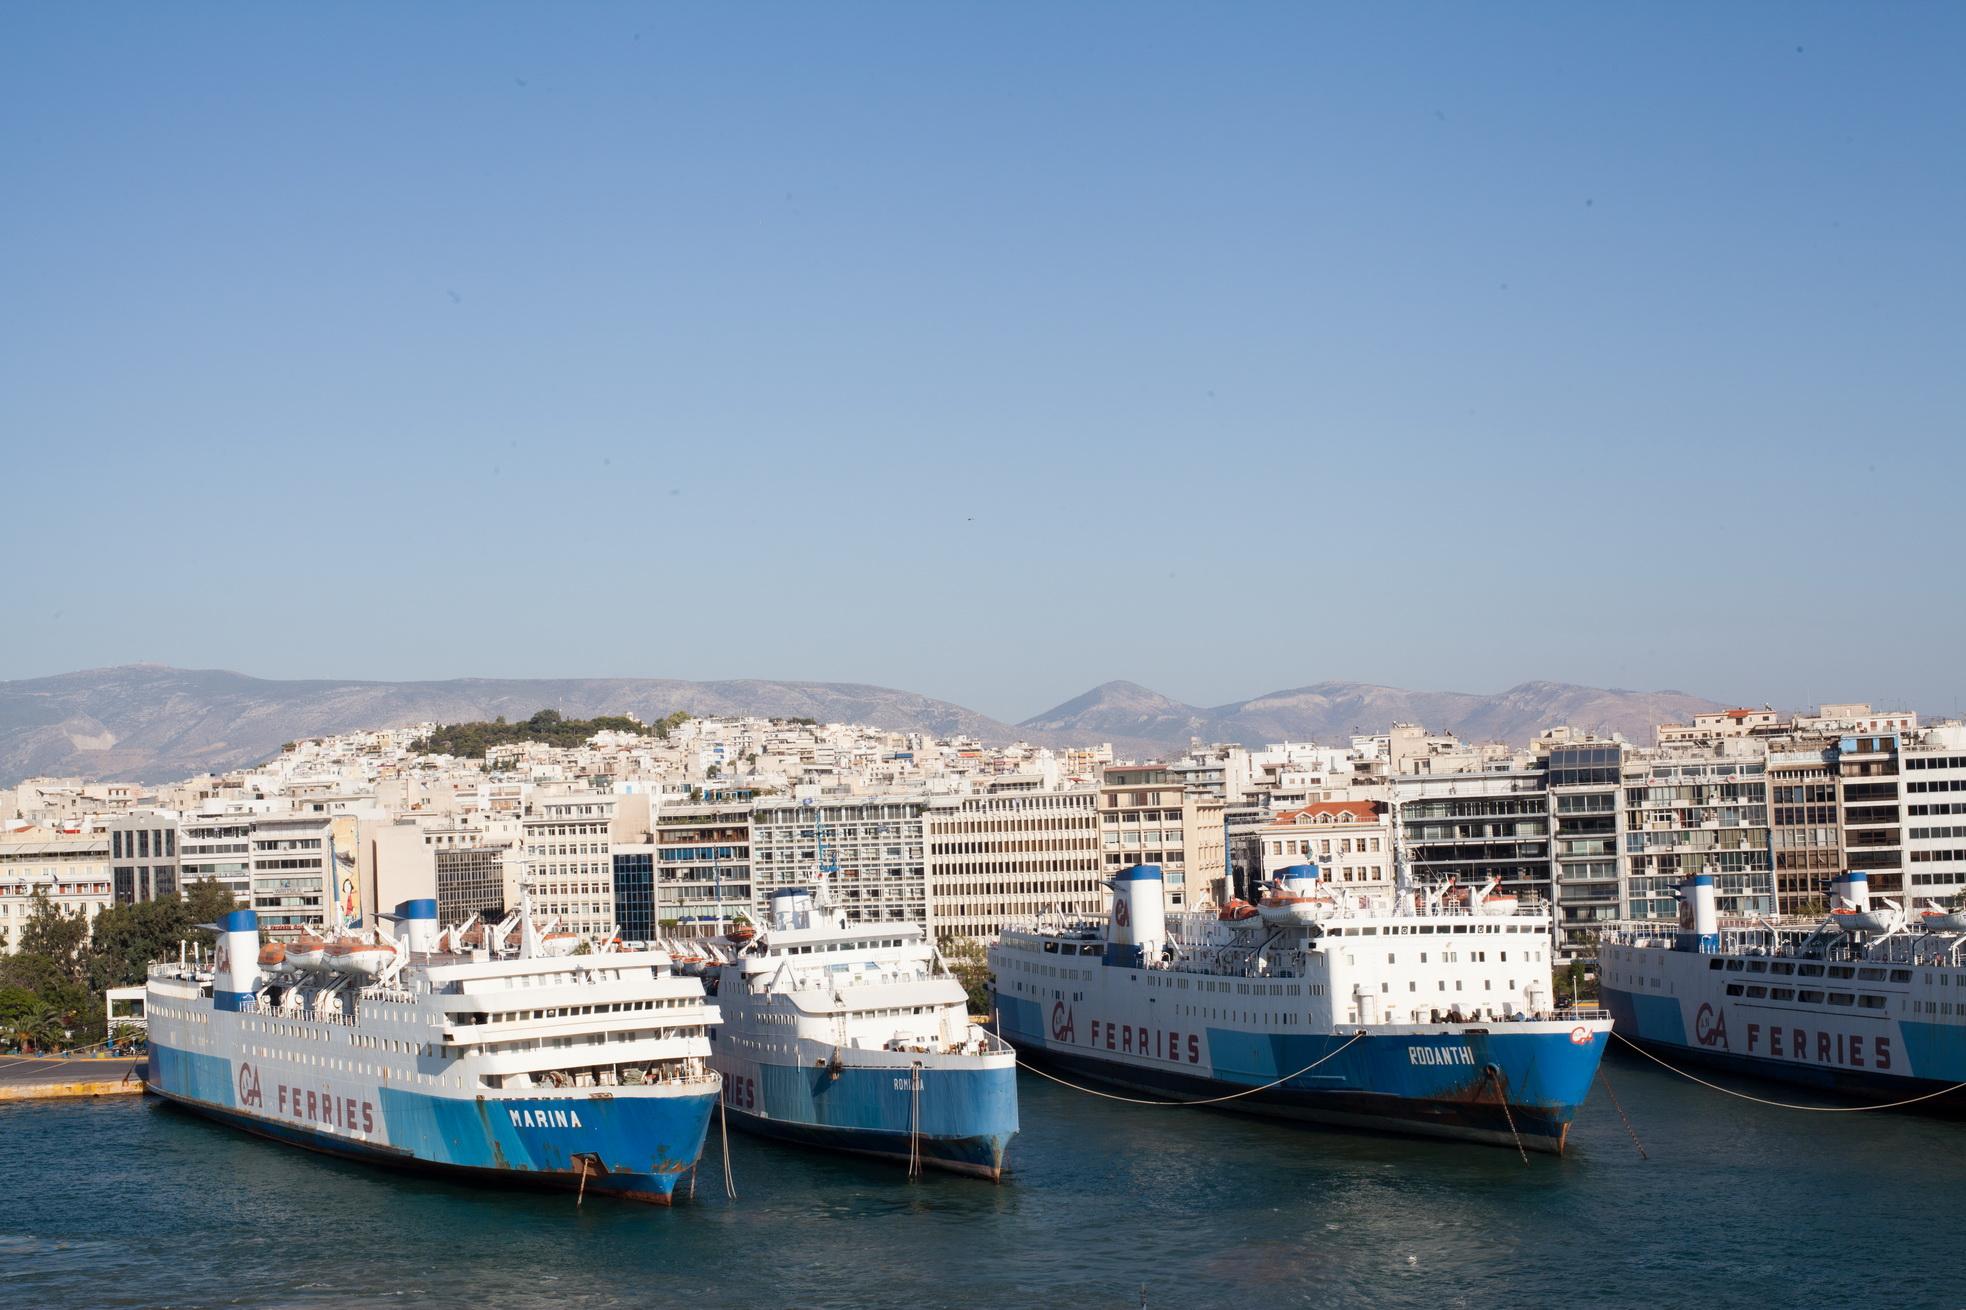 MS Rodanthi IMO 7353078 GA Ferries docked Piraeus Port of Athens Greece 02